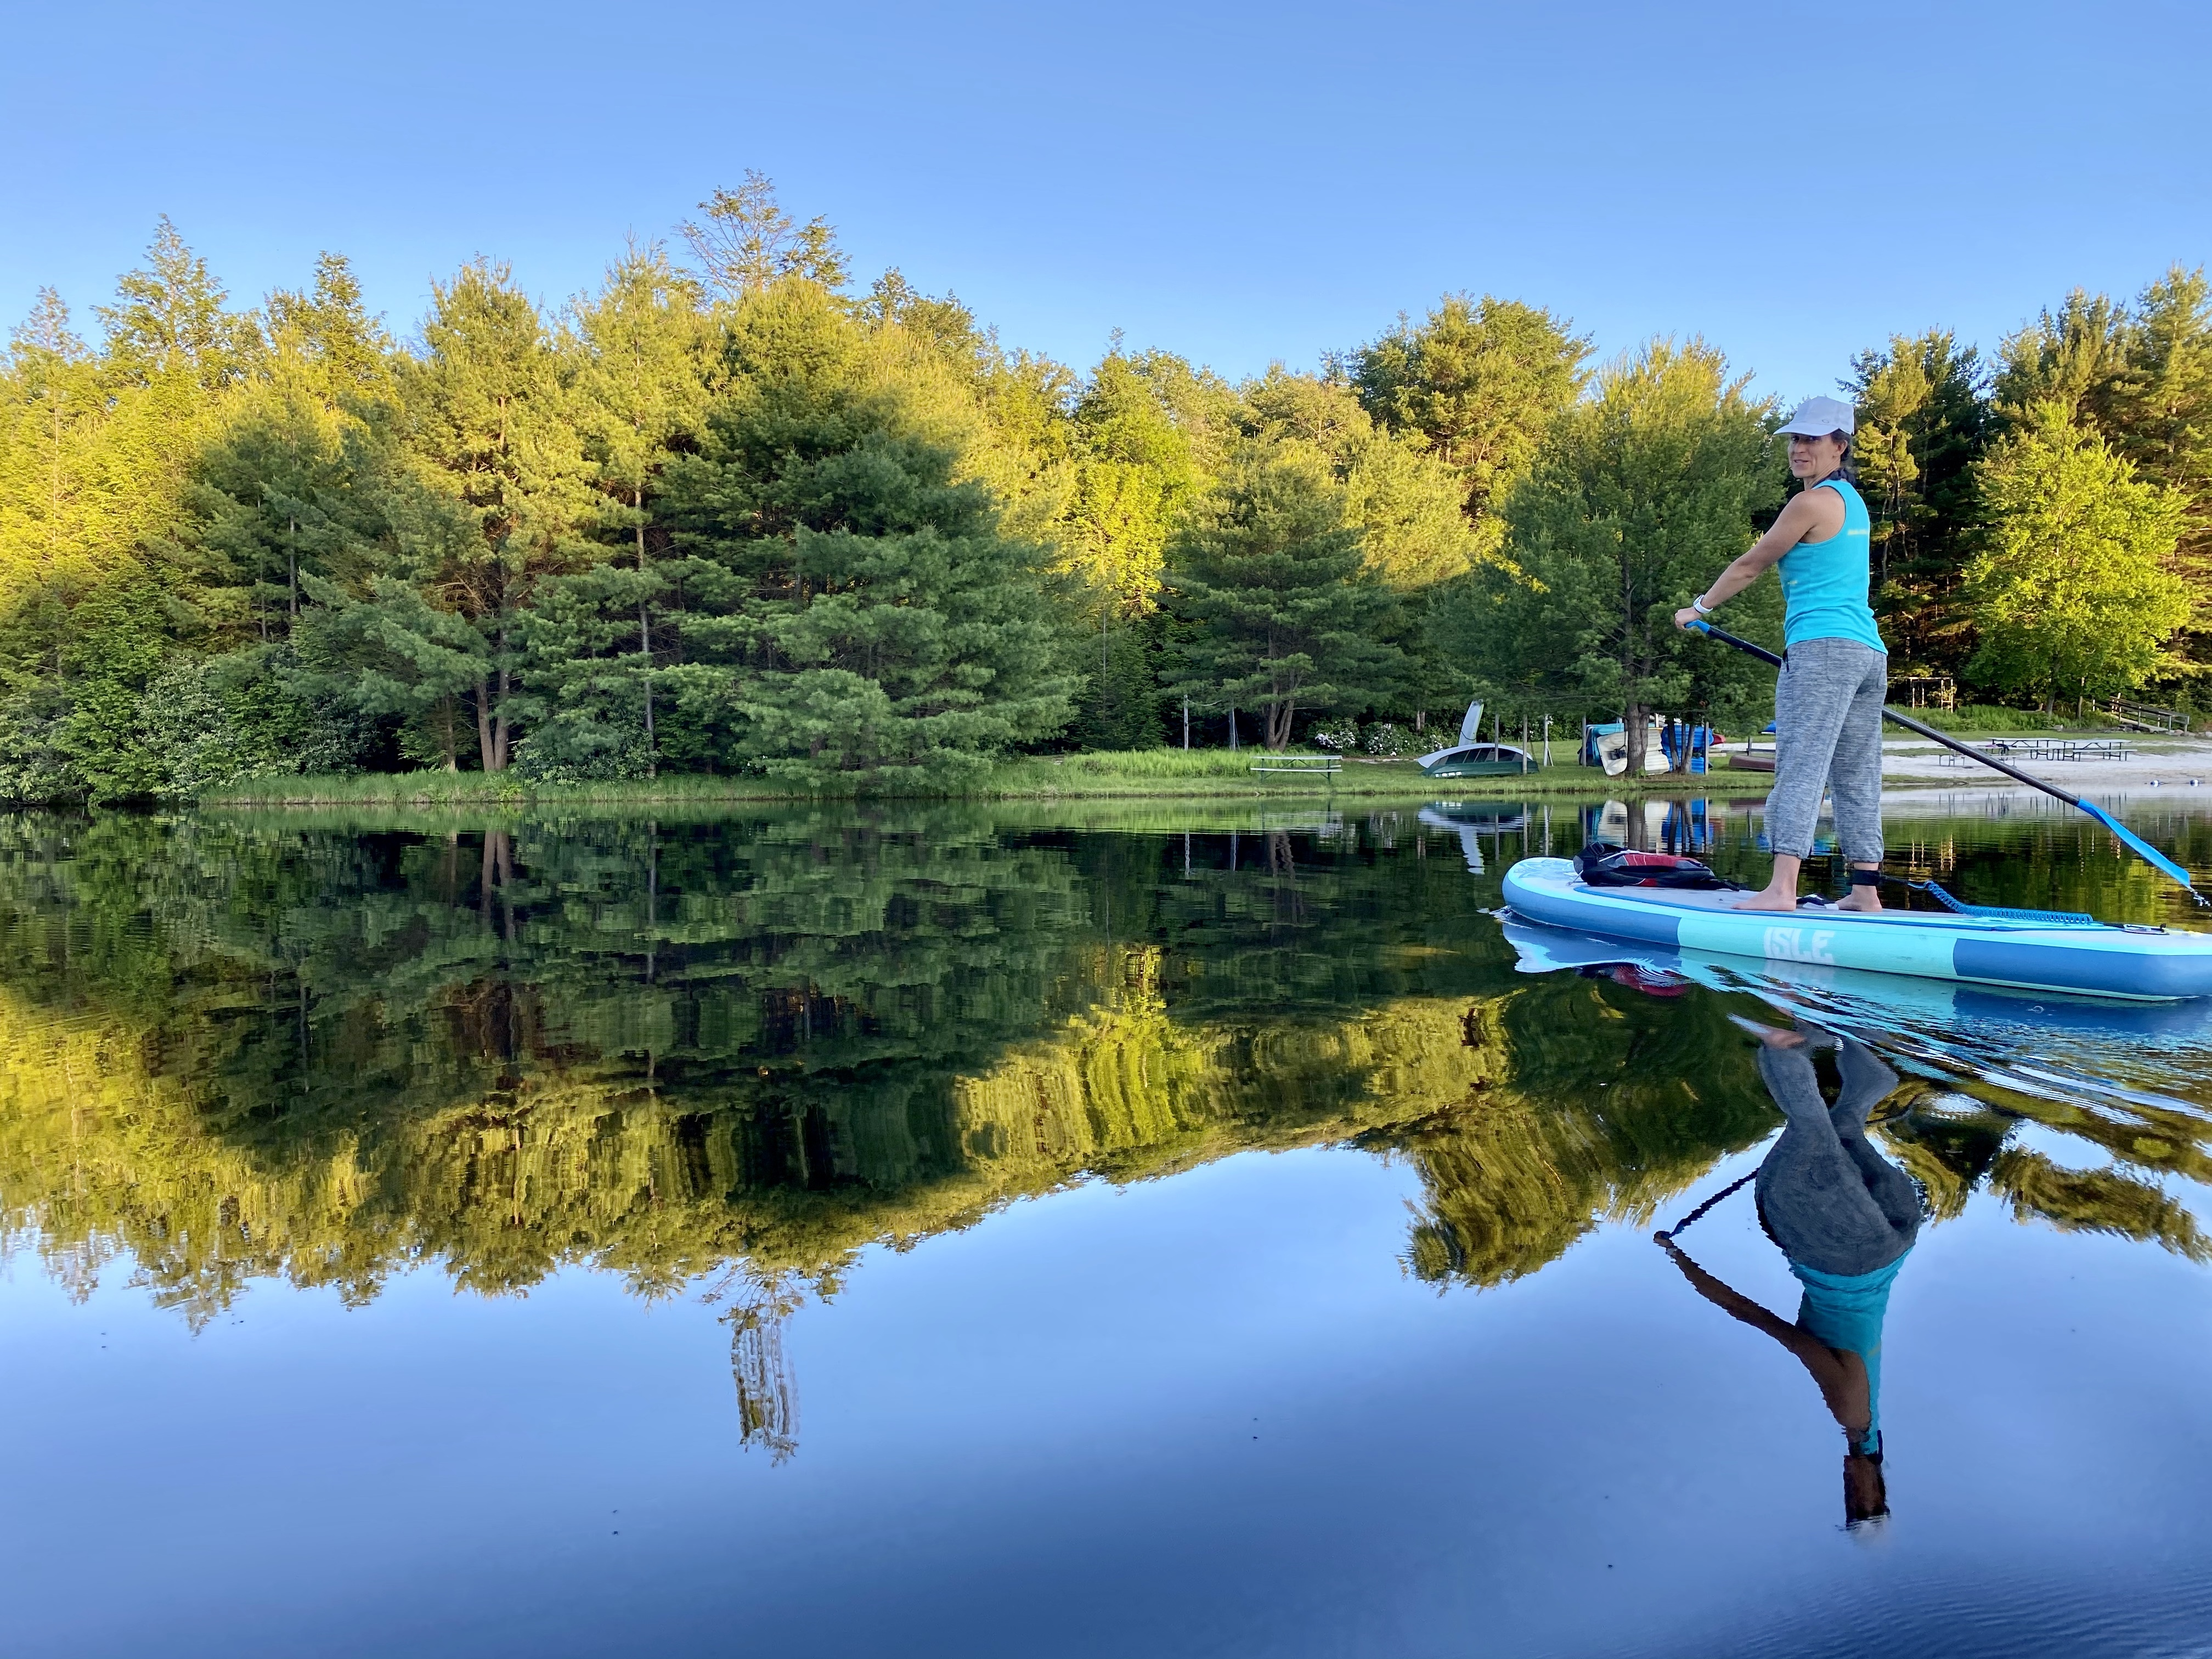 Lisa paddling on lake in Poconos